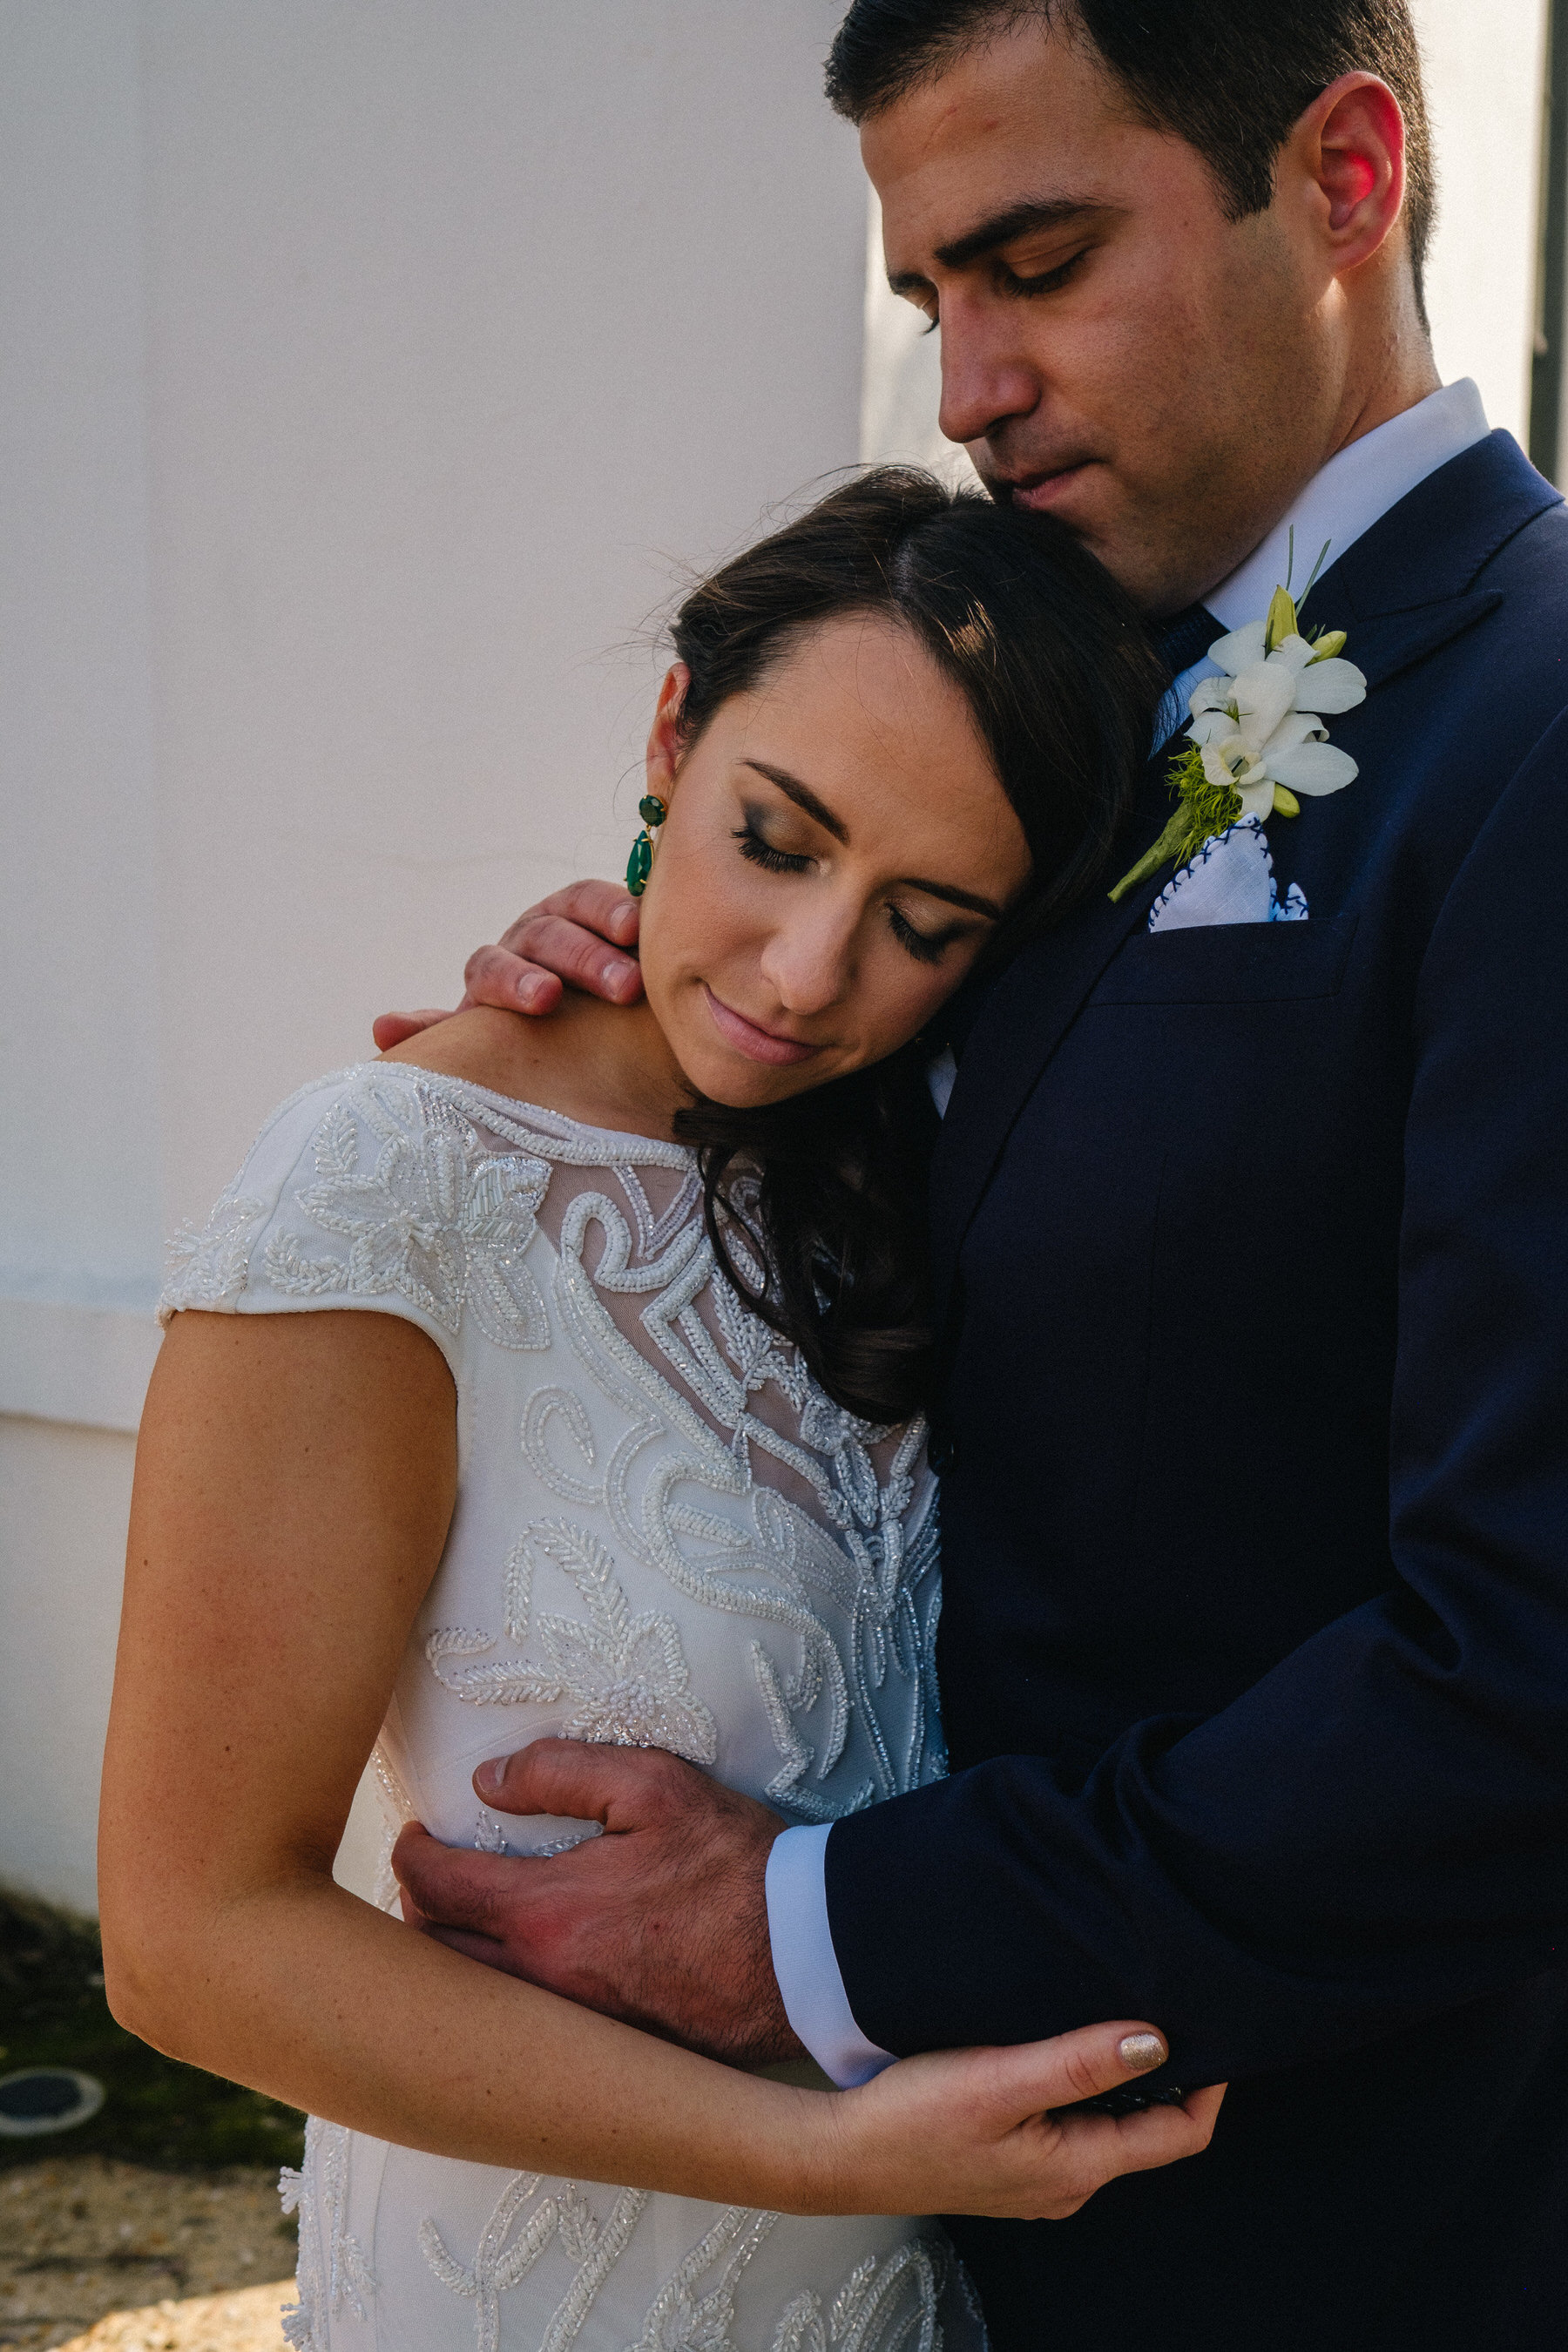 Oxford_mississippi_wedding_photographer_025.jpg